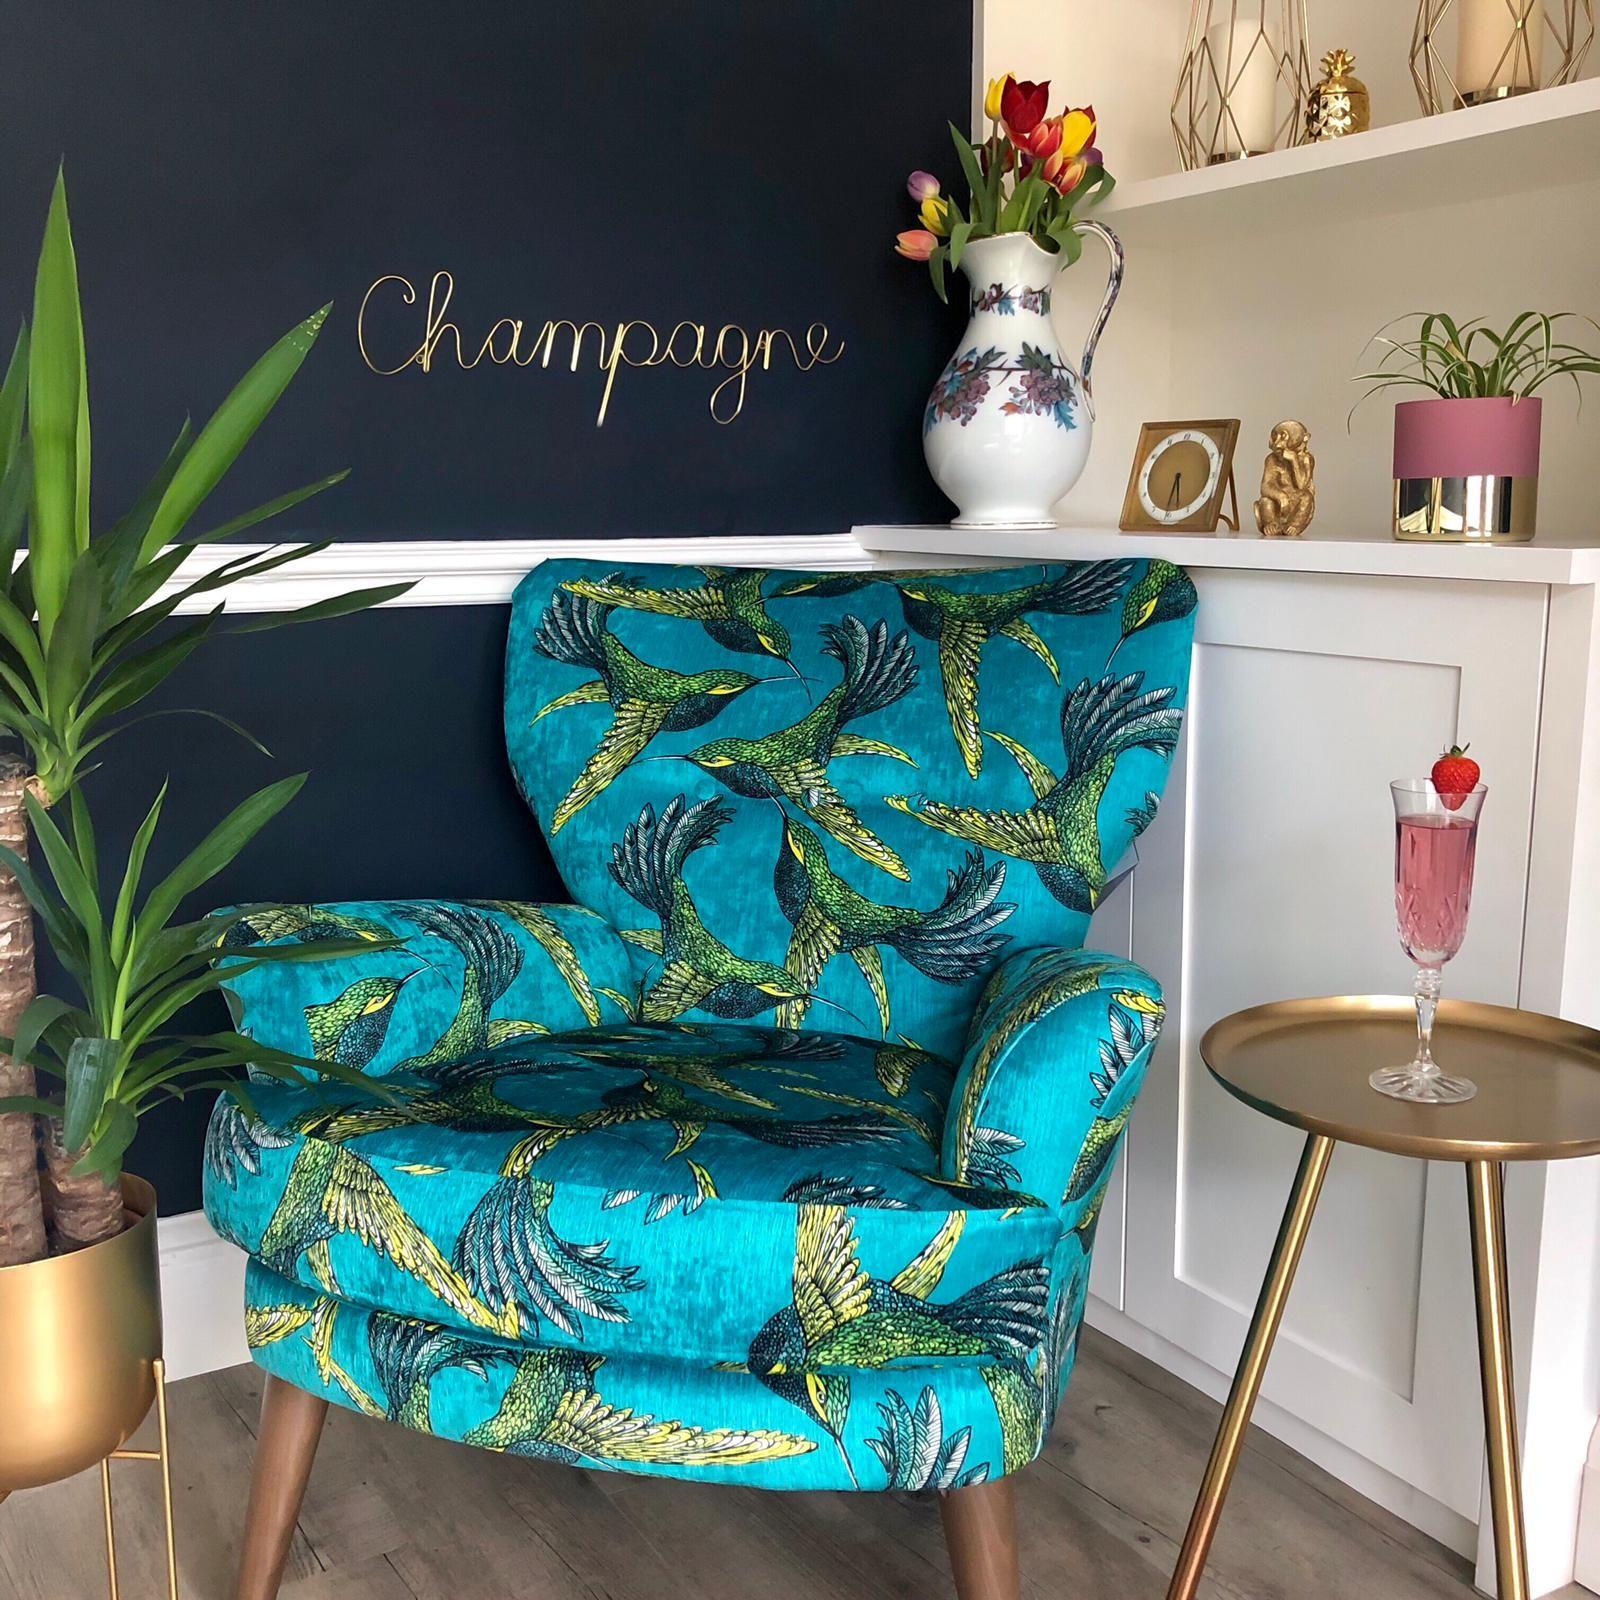 'Champagne ' Wire Word Gold | Home decor, Lounge decor ...